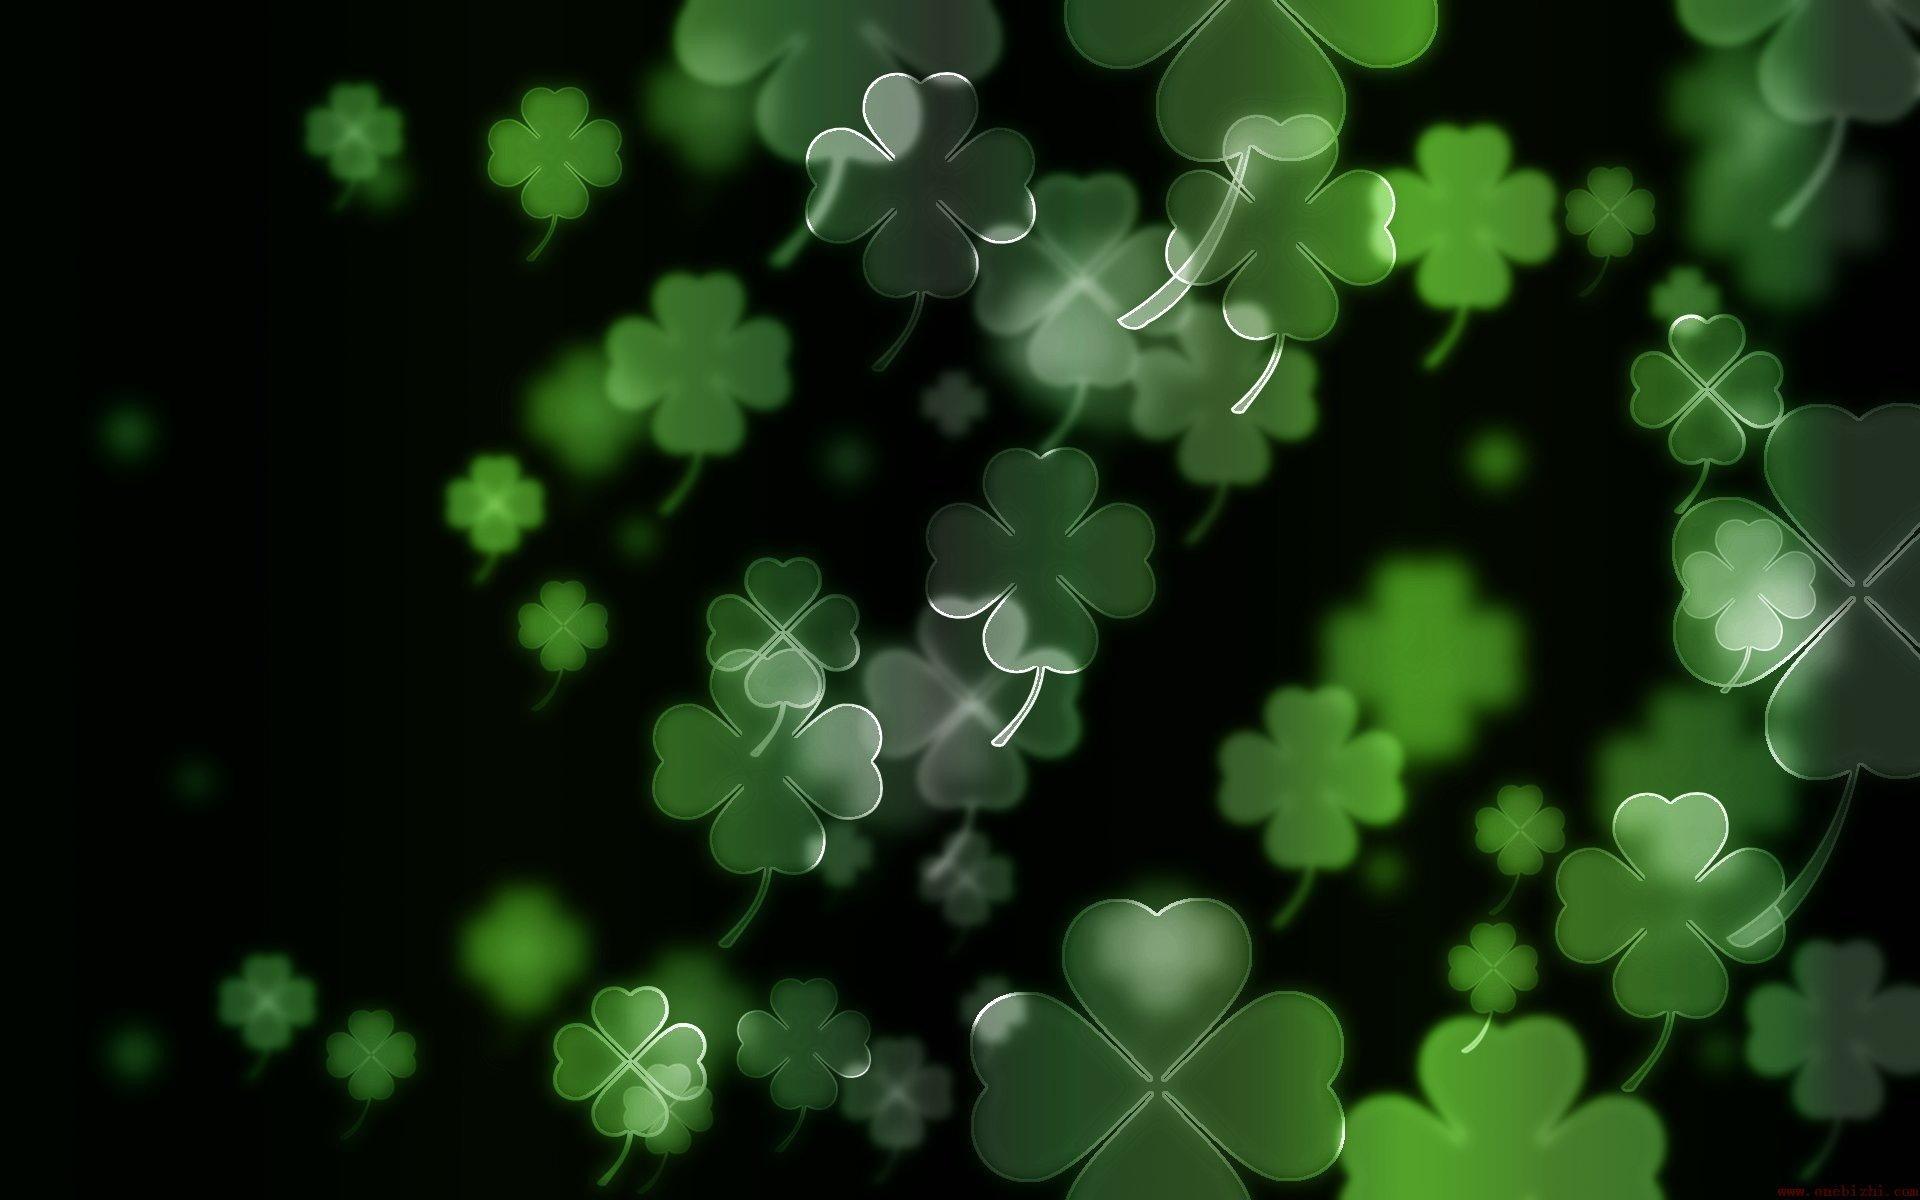 luck irish four leaf clover Clovers wallpaper background 1920x1200